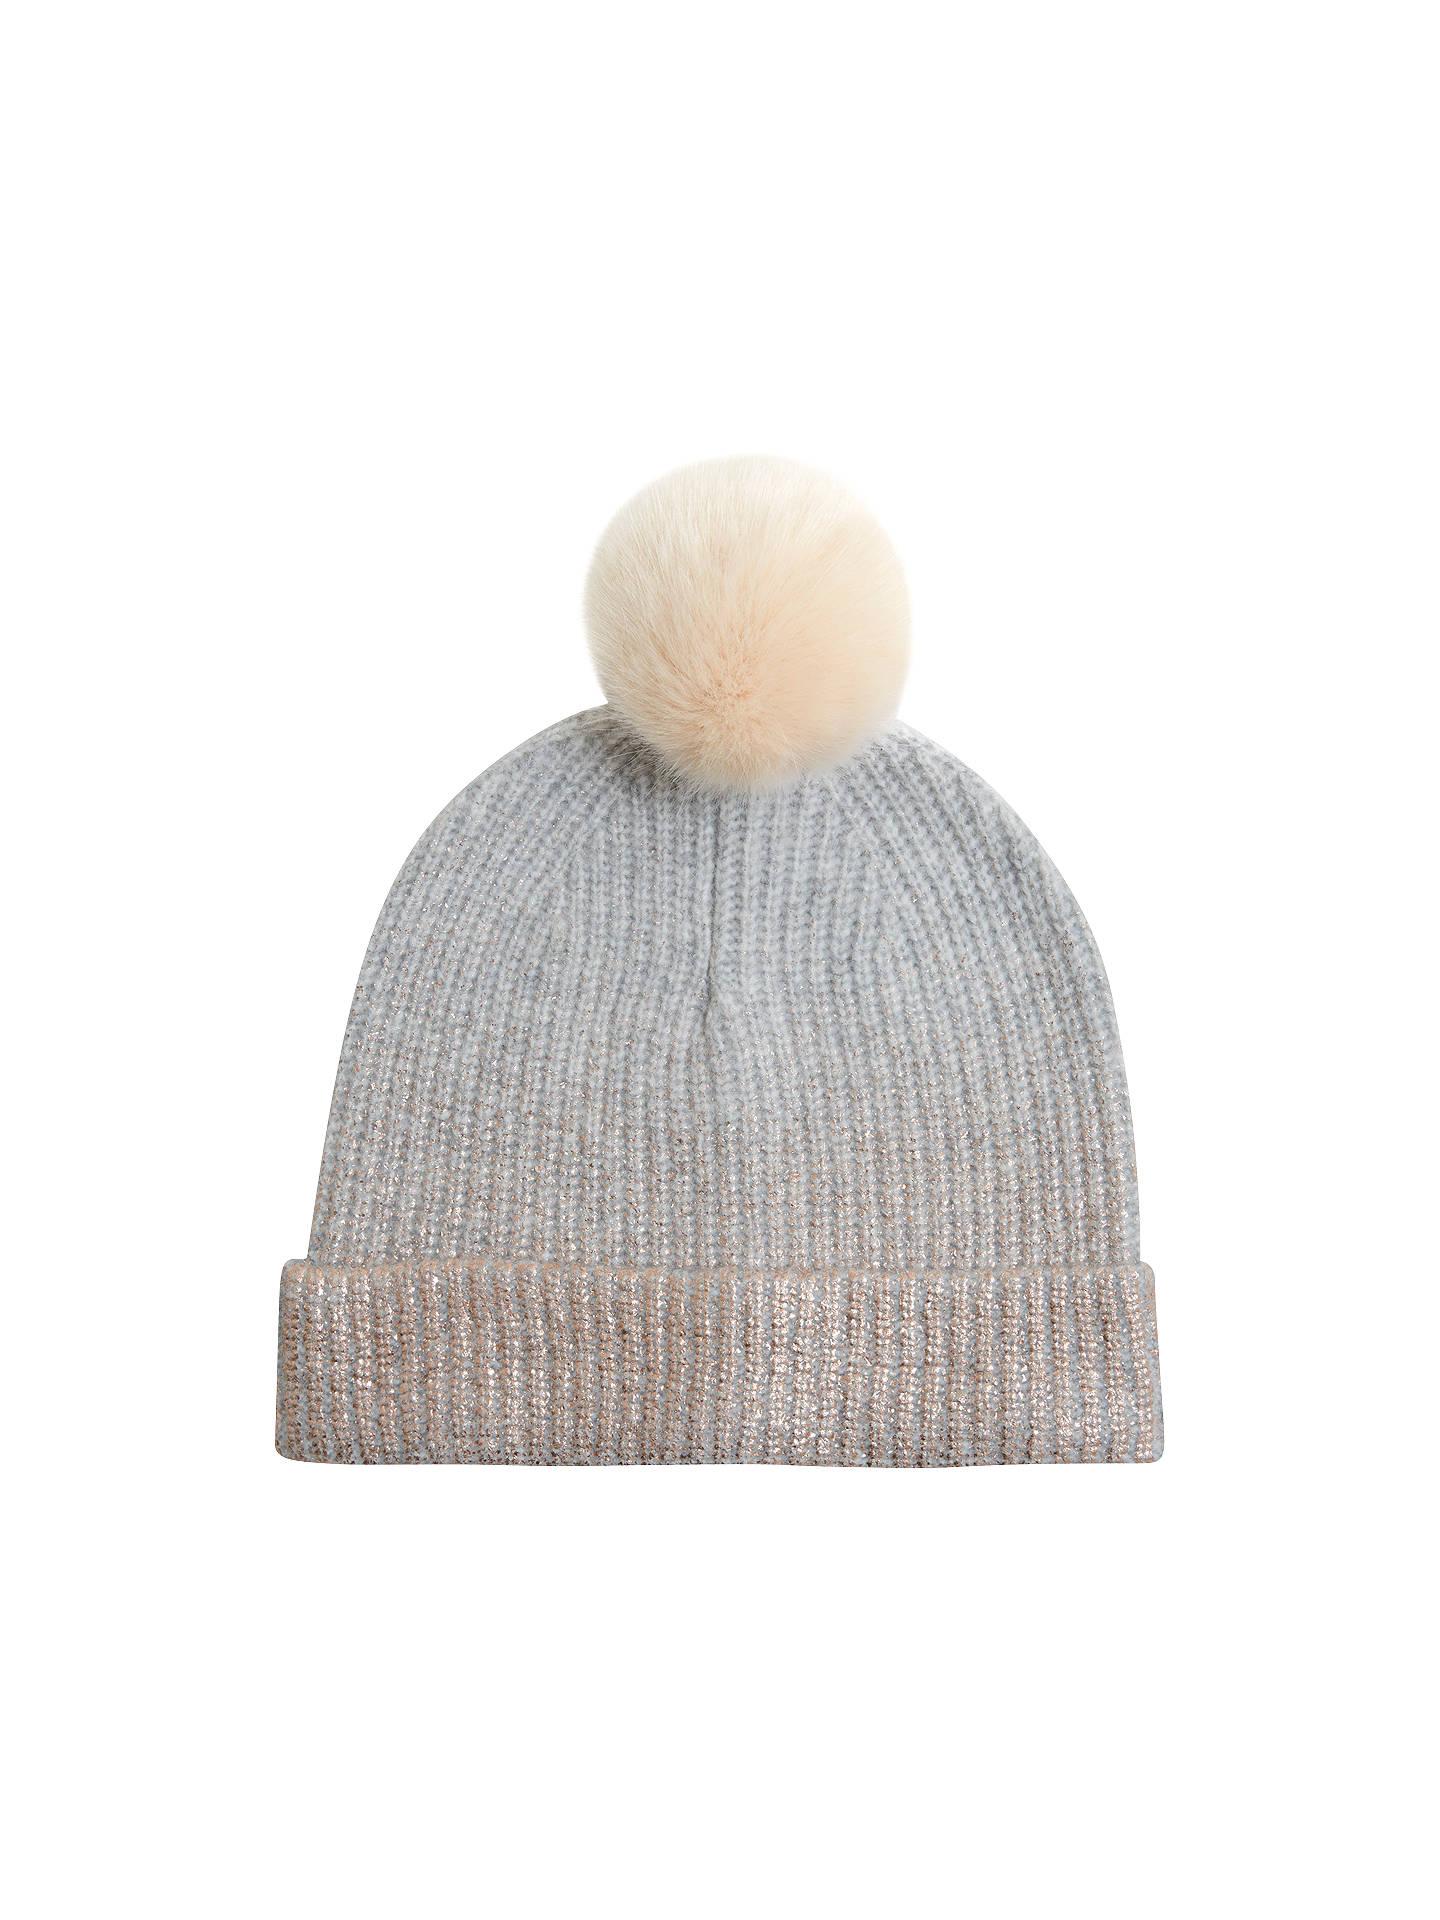 f005b8c3cdb Buy Hygge by Mint Velvet Foil Printed Pom Pom Hat